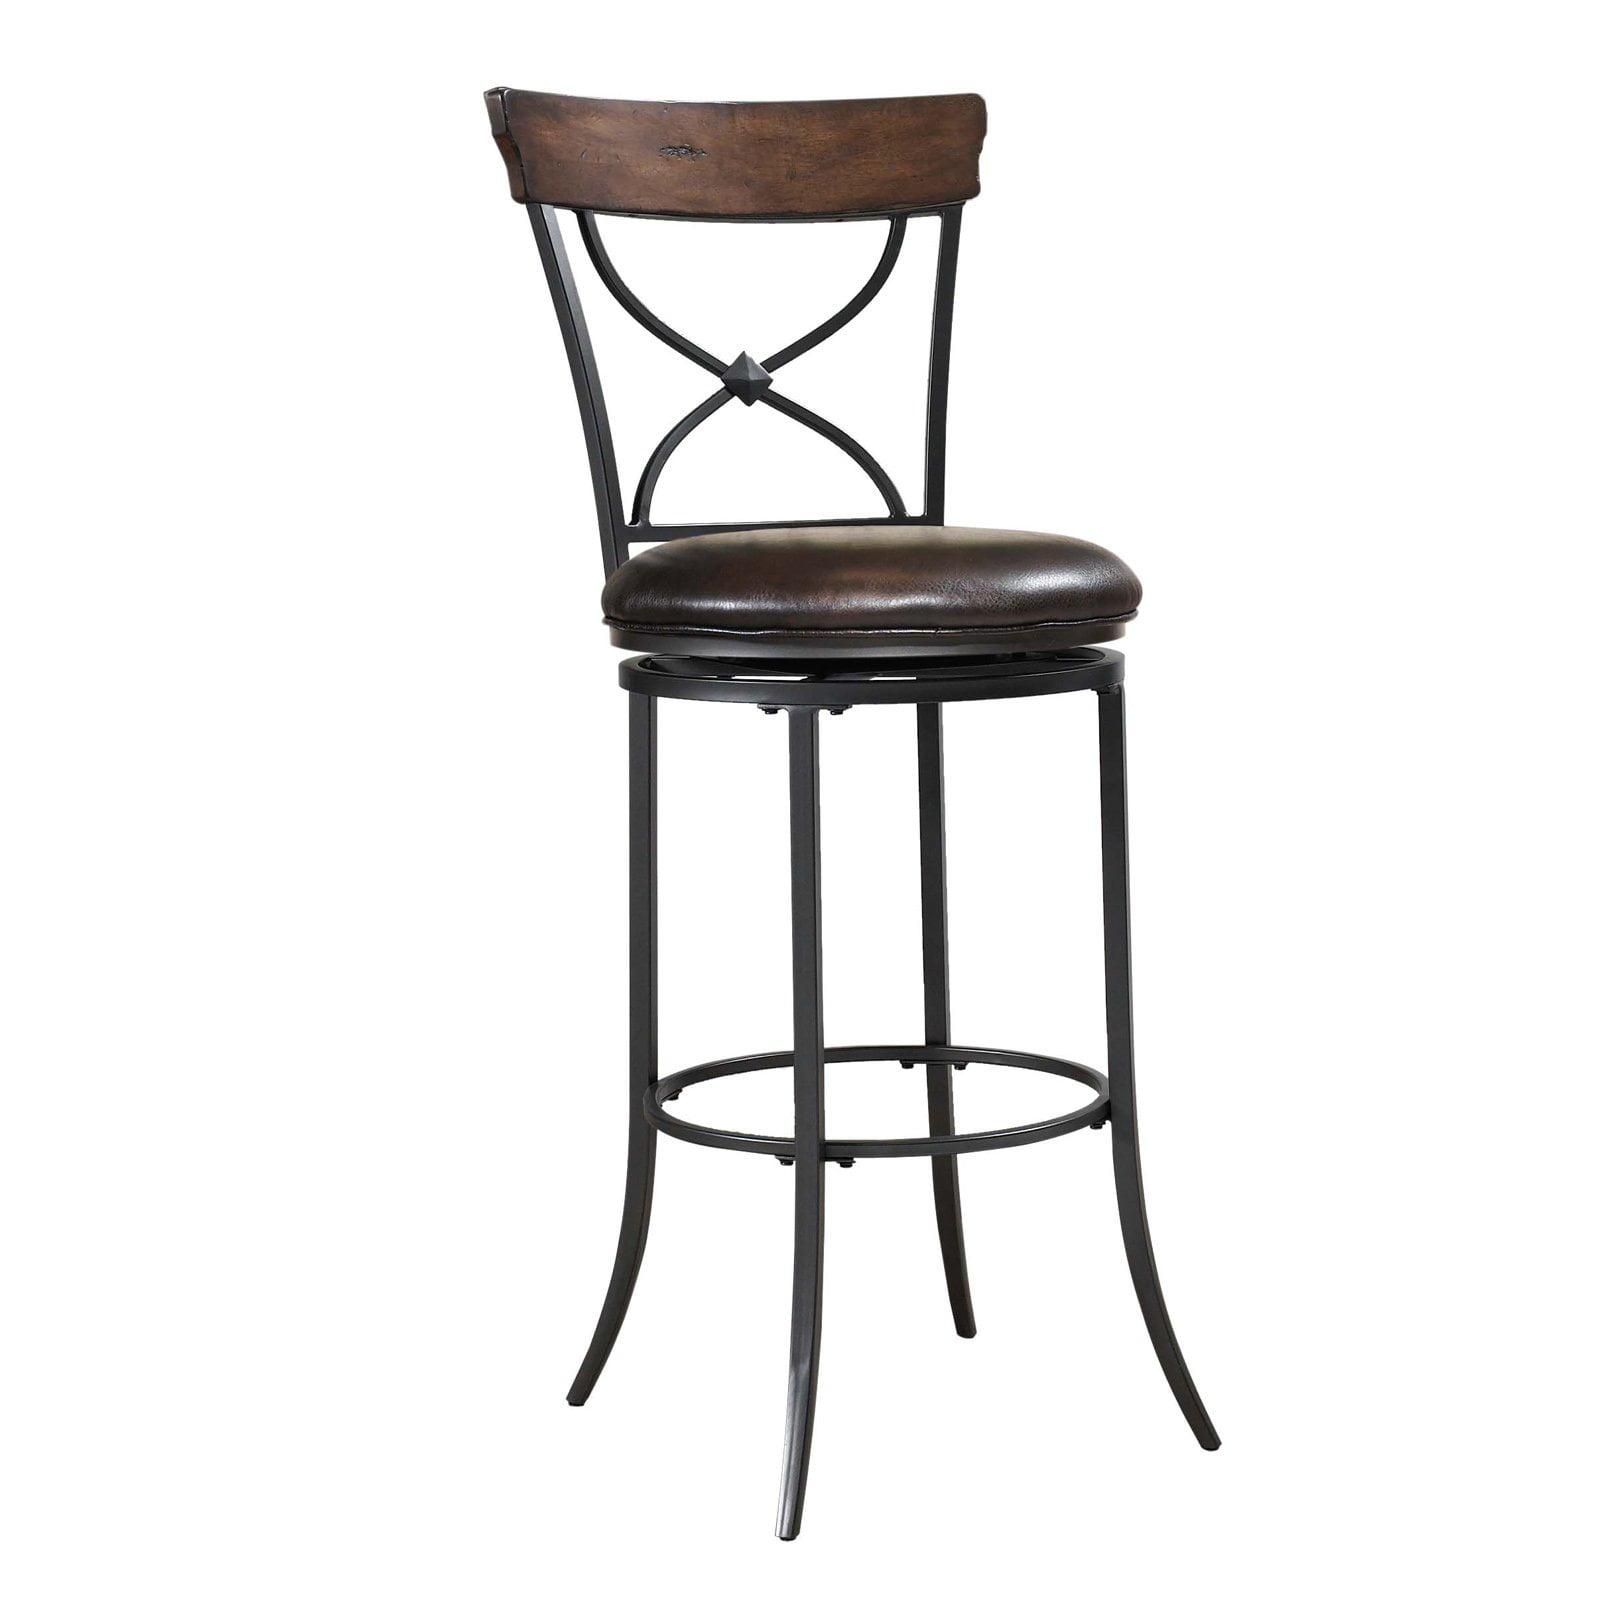 Astonishing Hillsdale Furniture Cameron 44 5 X Back Swivel Bar Stool Chestnut Brown Finish Cjindustries Chair Design For Home Cjindustriesco